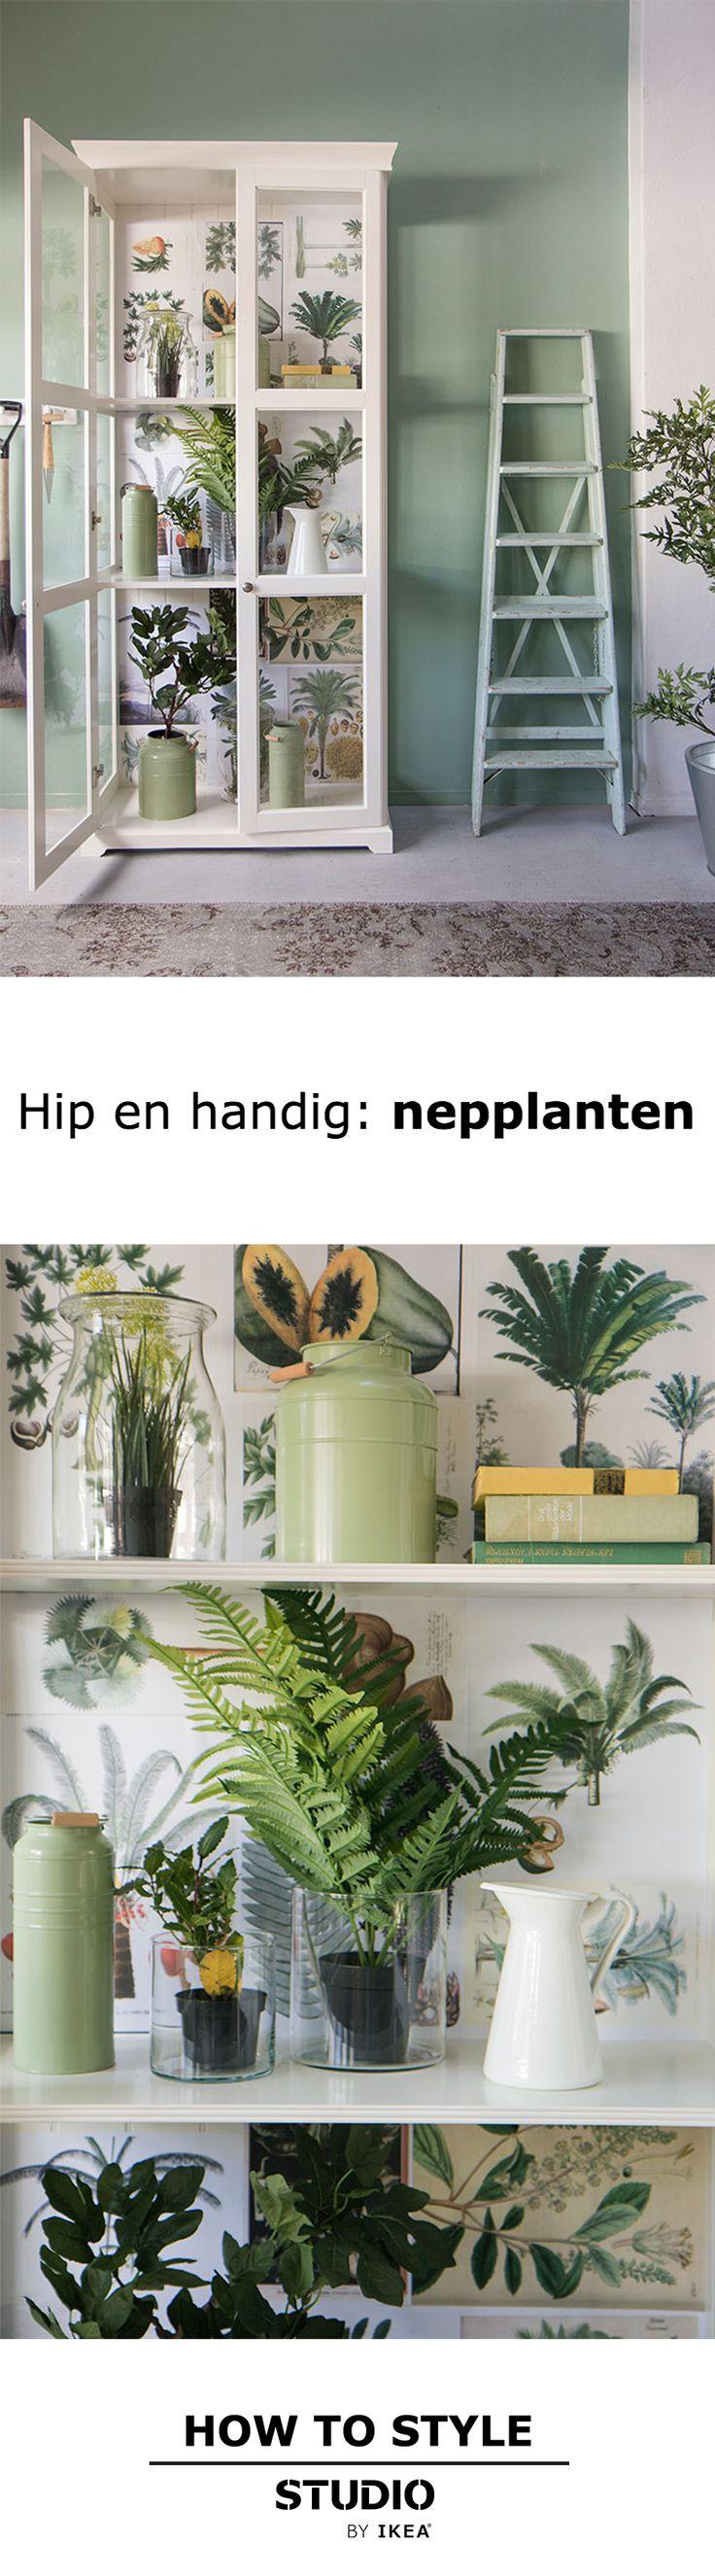 STUDIO by IKEA - Hip en handig: nepplanten | IKEA IKEAnl IKEAnederland HowTo HowToStyle DIY Planten Nepplanten Fake Nep Groen Natuurlijk Natuurlijk Organisch Duurzaam UrbanJungle Jungle